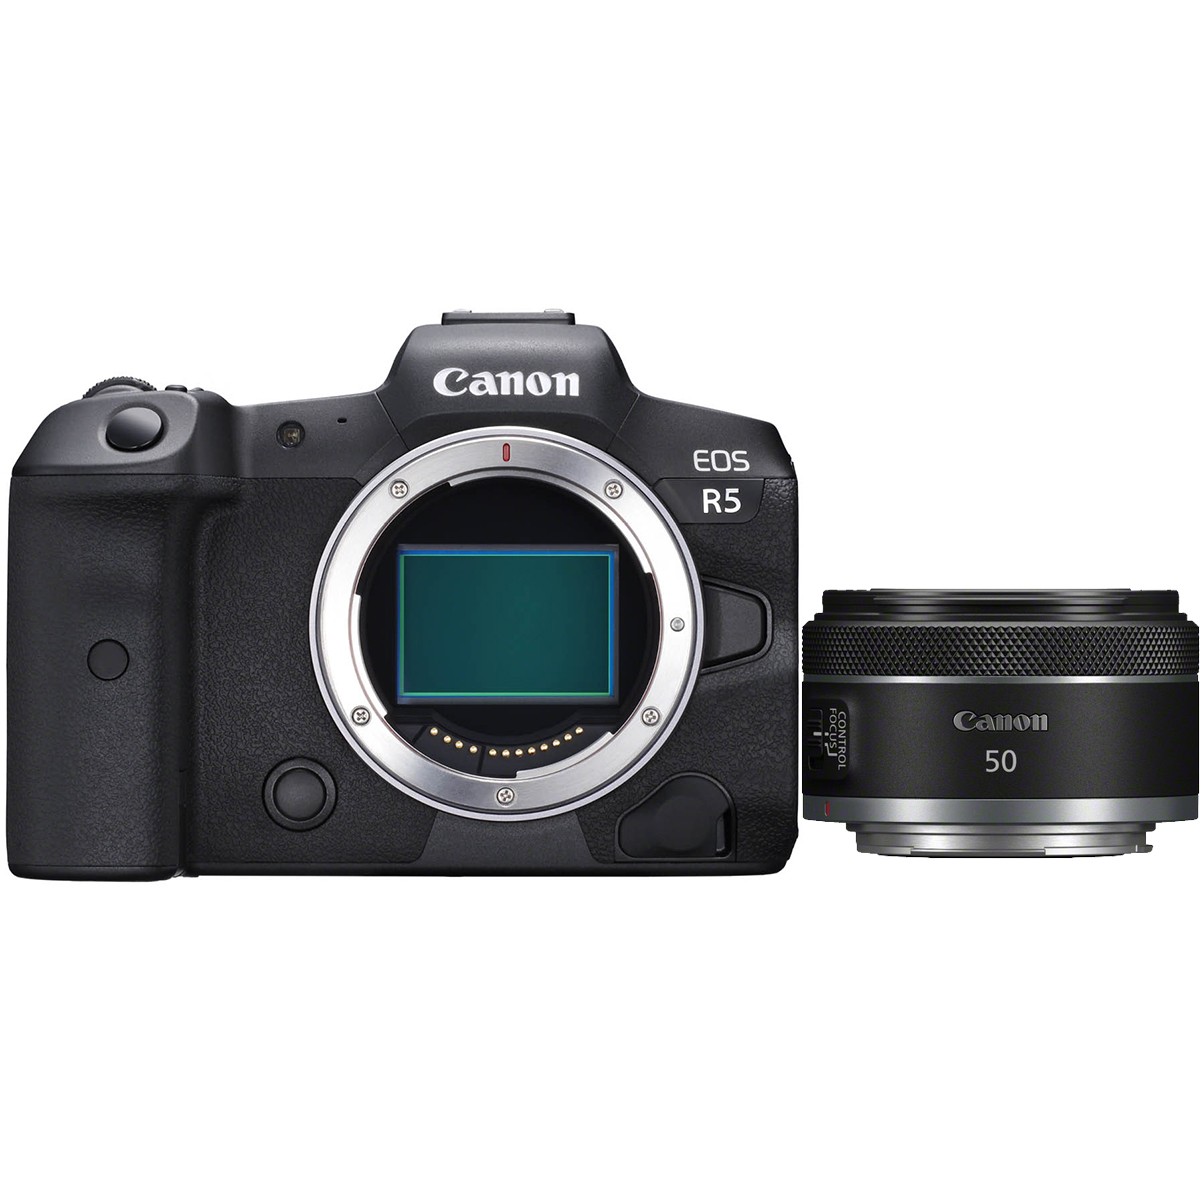 Canon EOS R5 Kit mit RF 50 mm 1:1,8